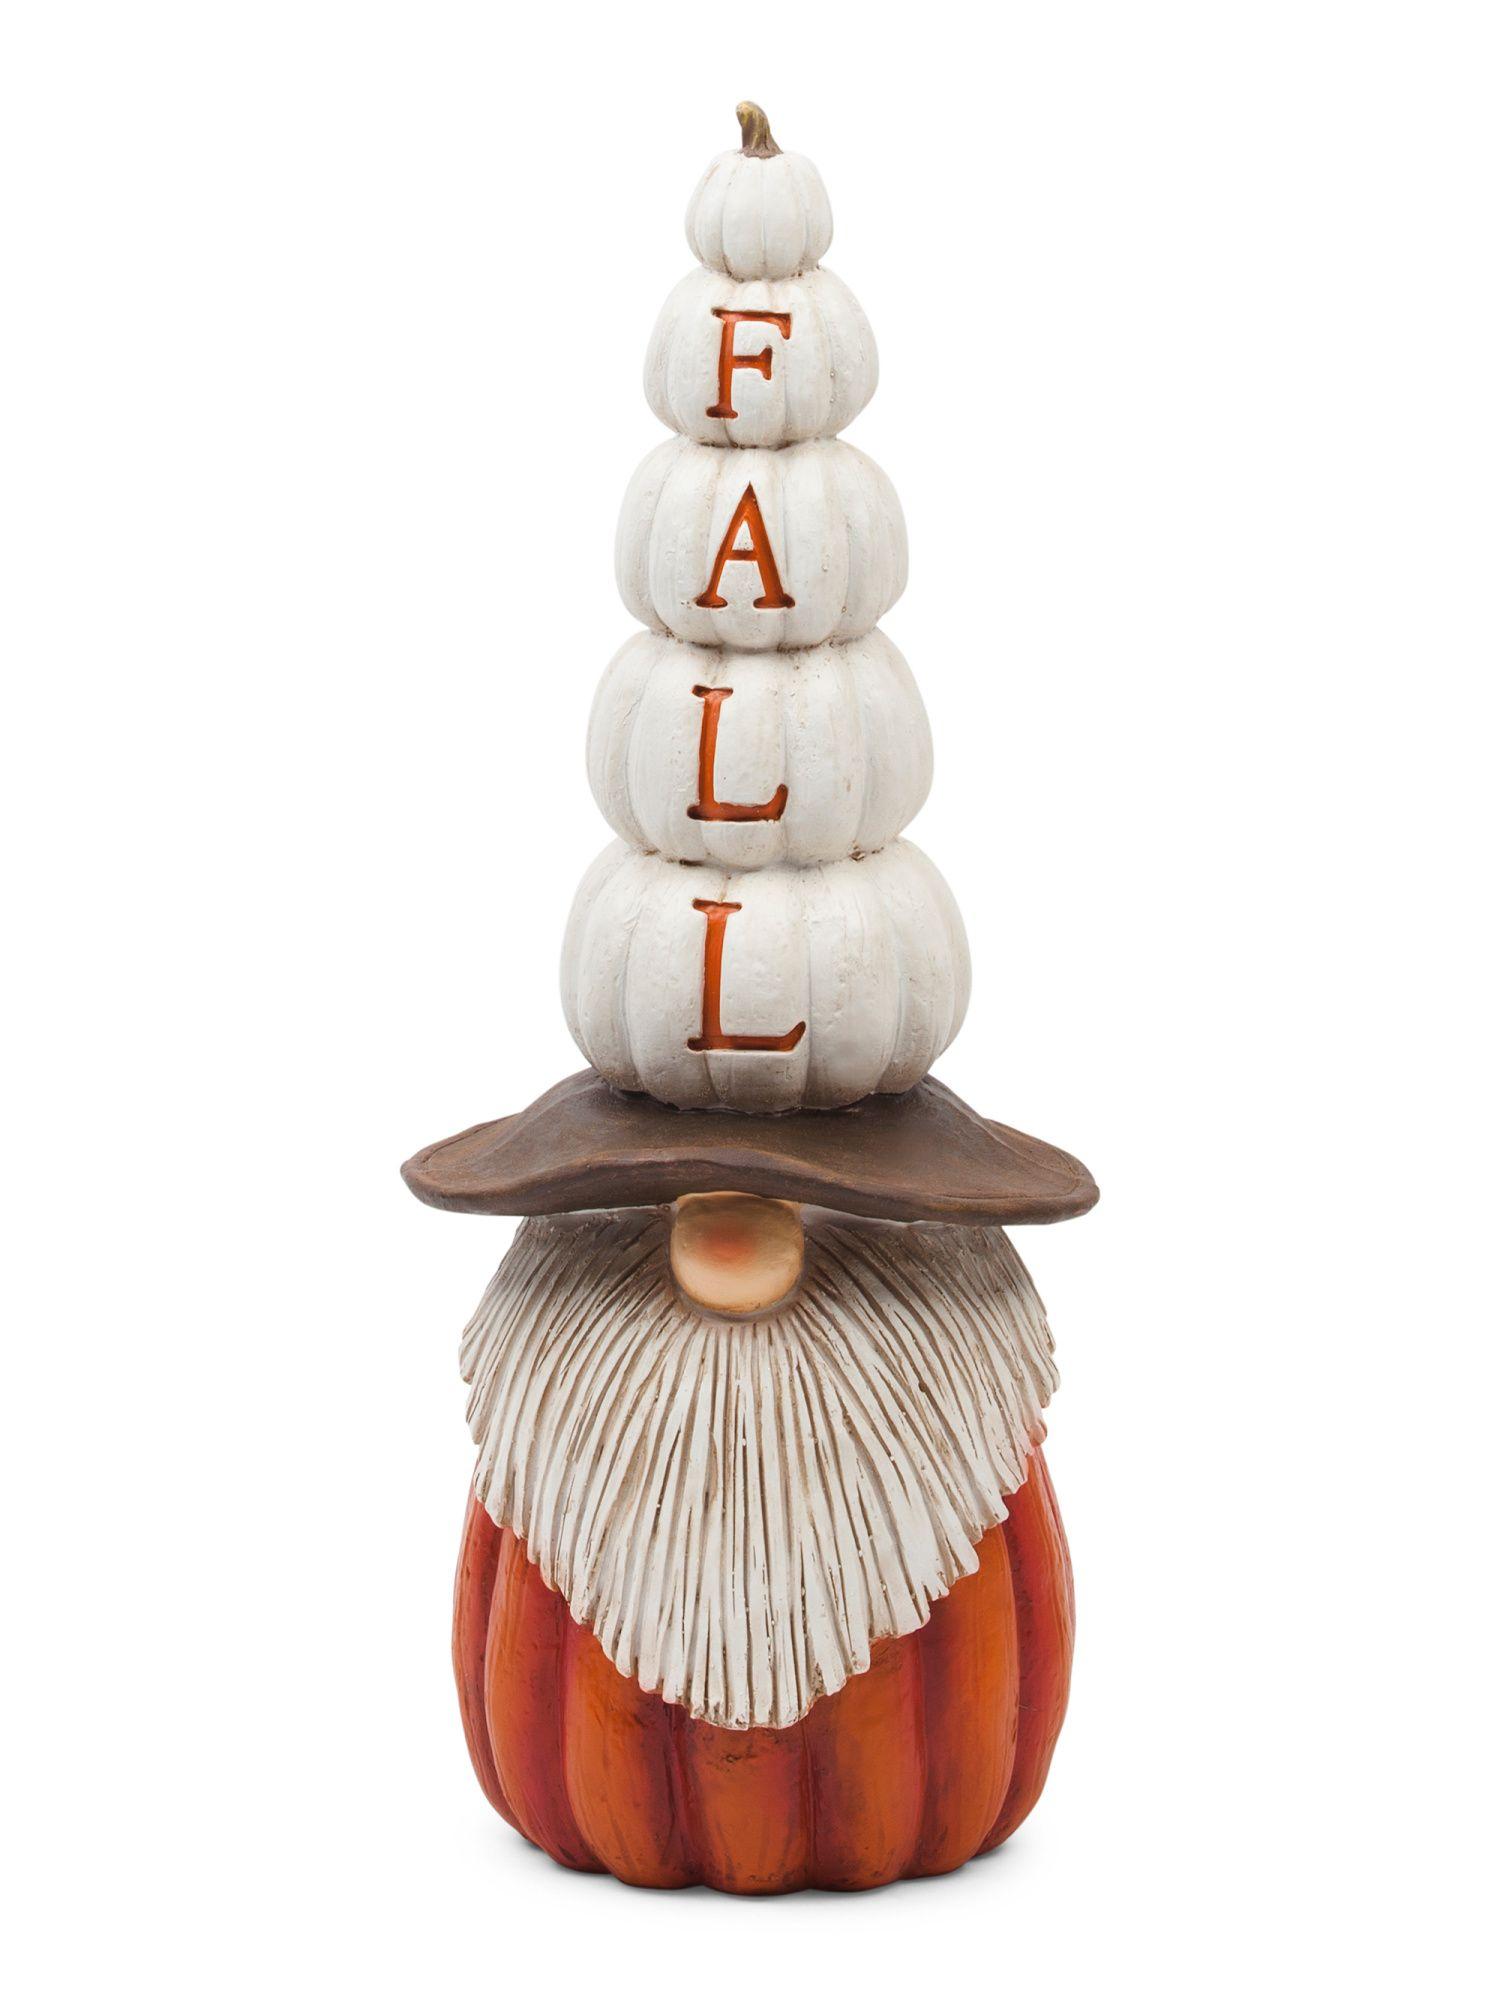 20in Pumpkin Gnome Decor Fall Decor T J Maxx Fall Decor 2020 Pumpkin Pillows Harvest Tablecloth